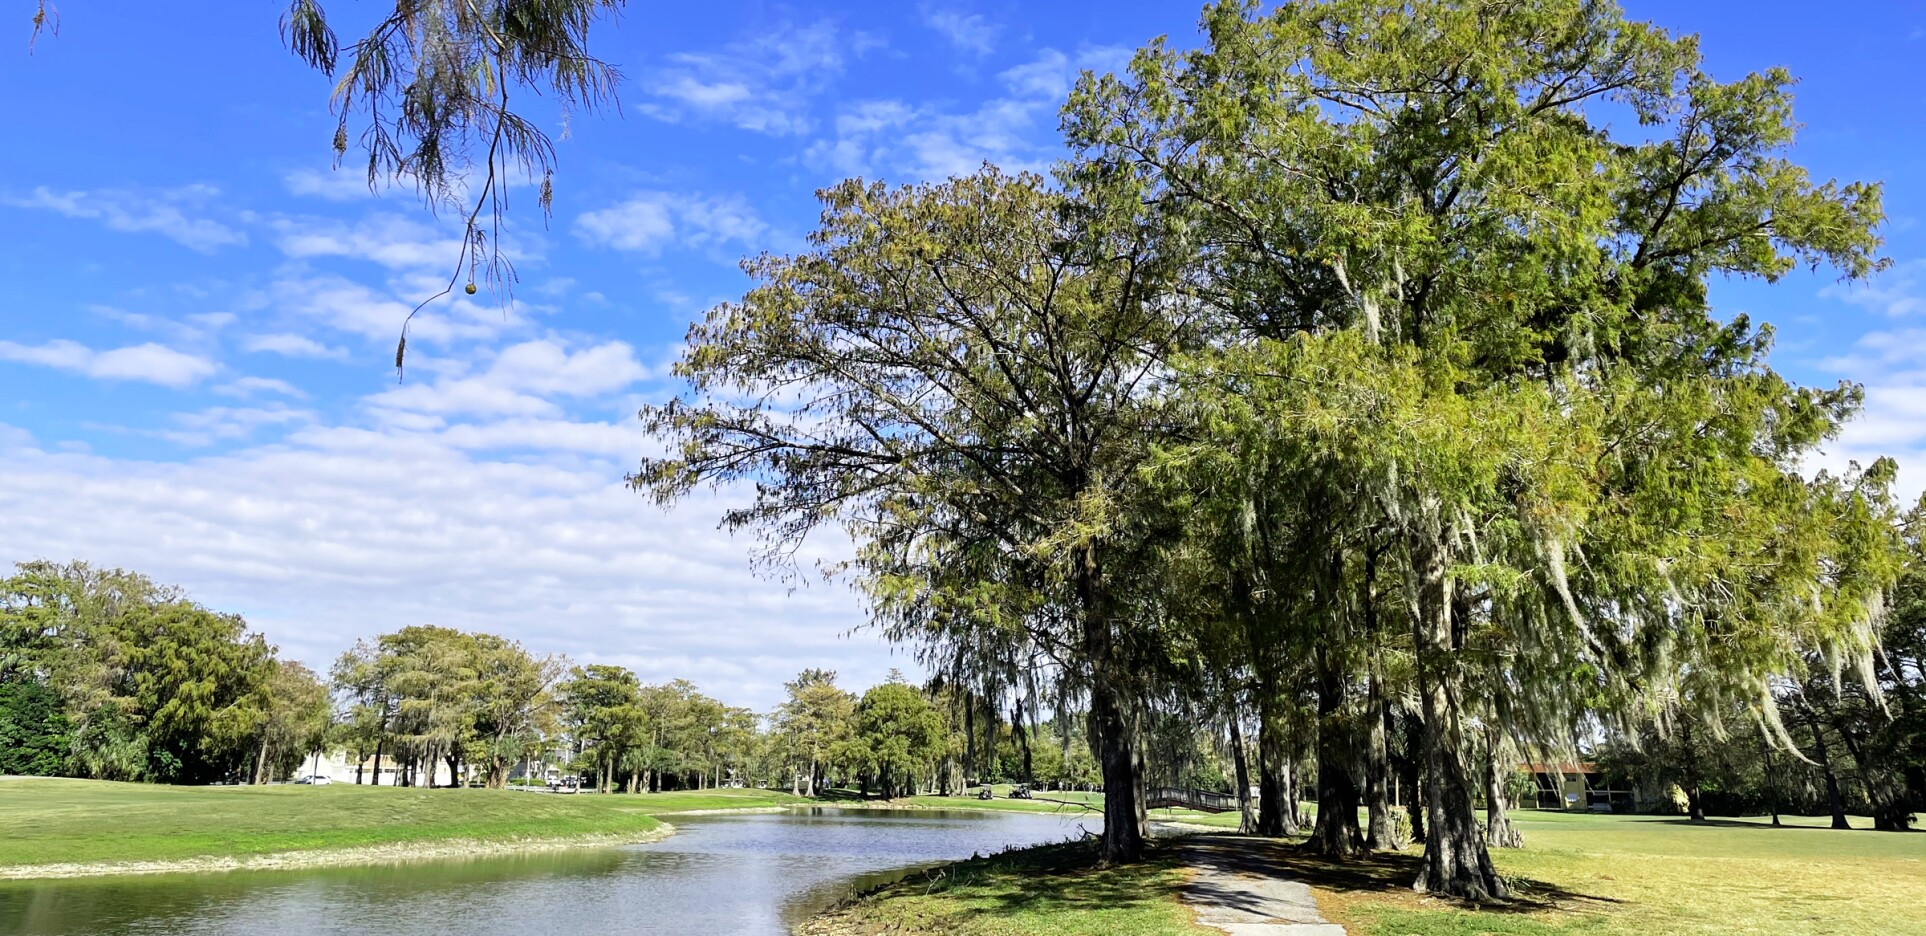 Lake view at Colony West Golf Club in Tamarac, Florida